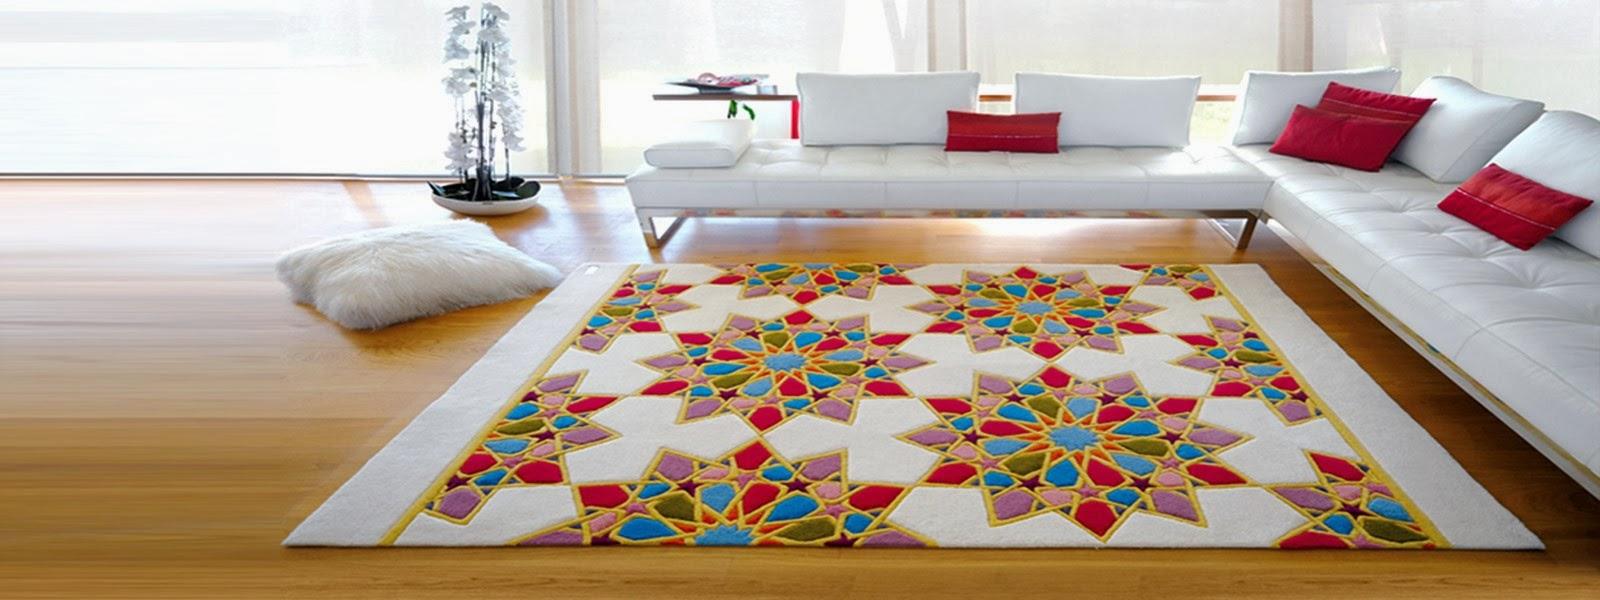 Tapis Marocain Traditionnel 2014 Salon Marocain